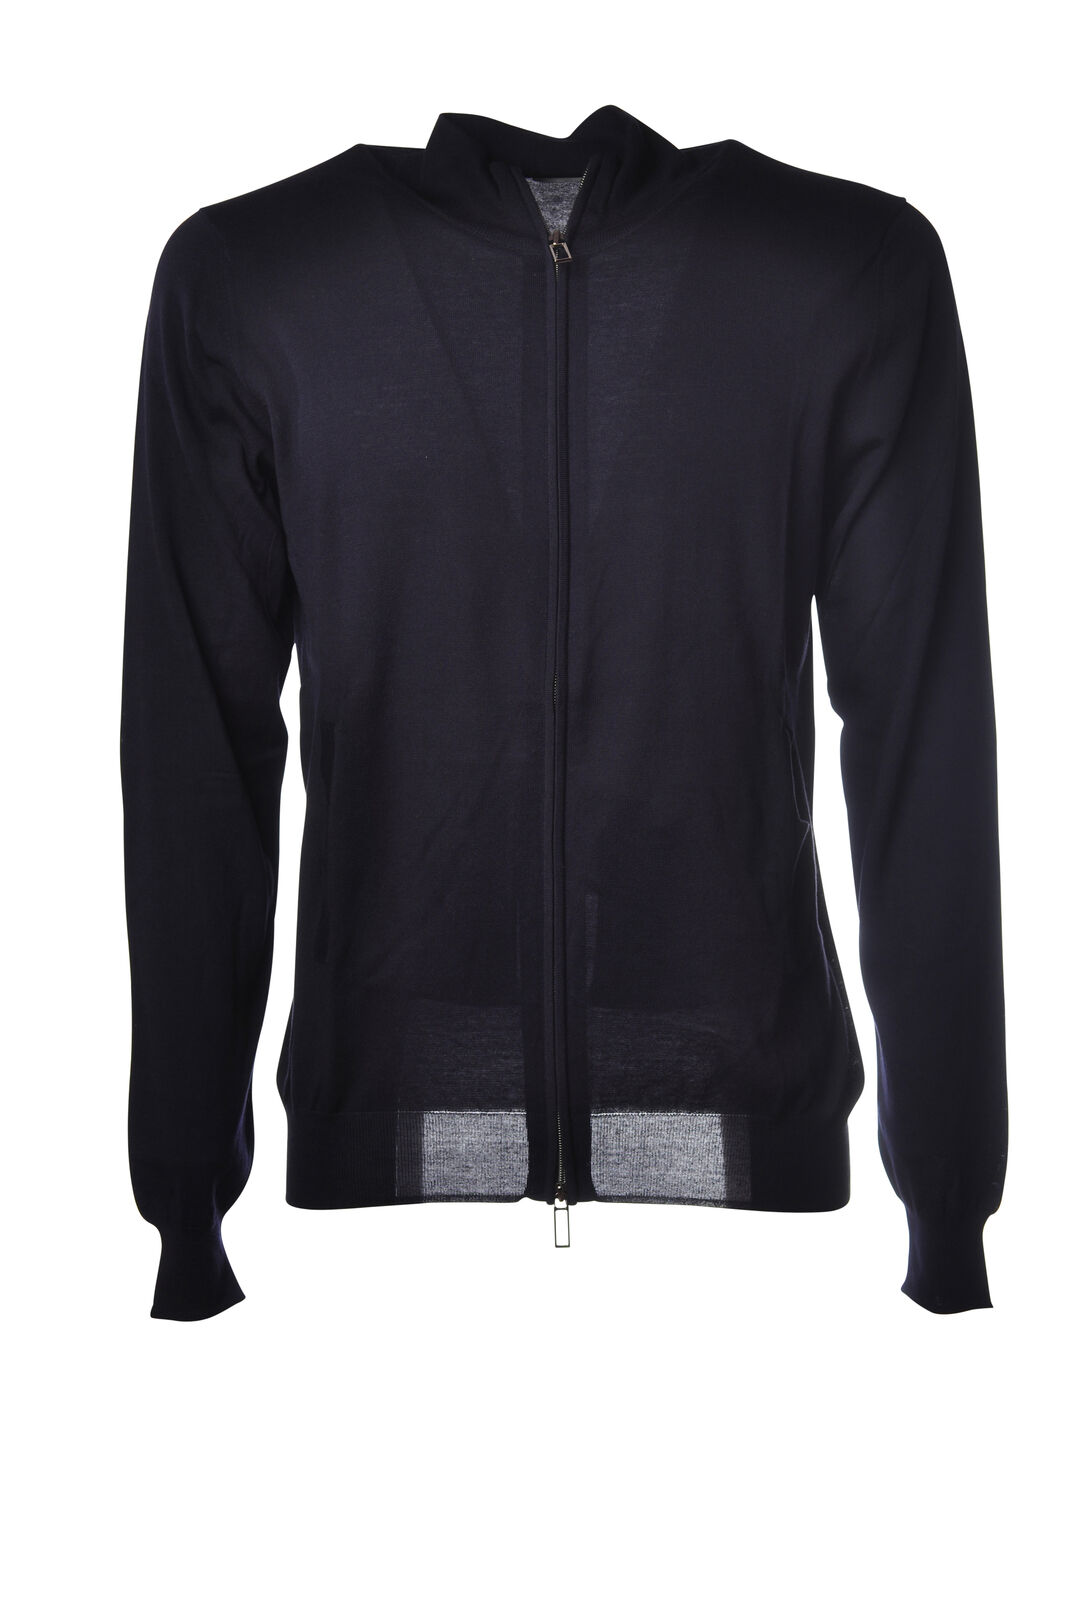 Paolo Pecora - Knitwear-Cardigan - Man - Blau - 5294113L185036